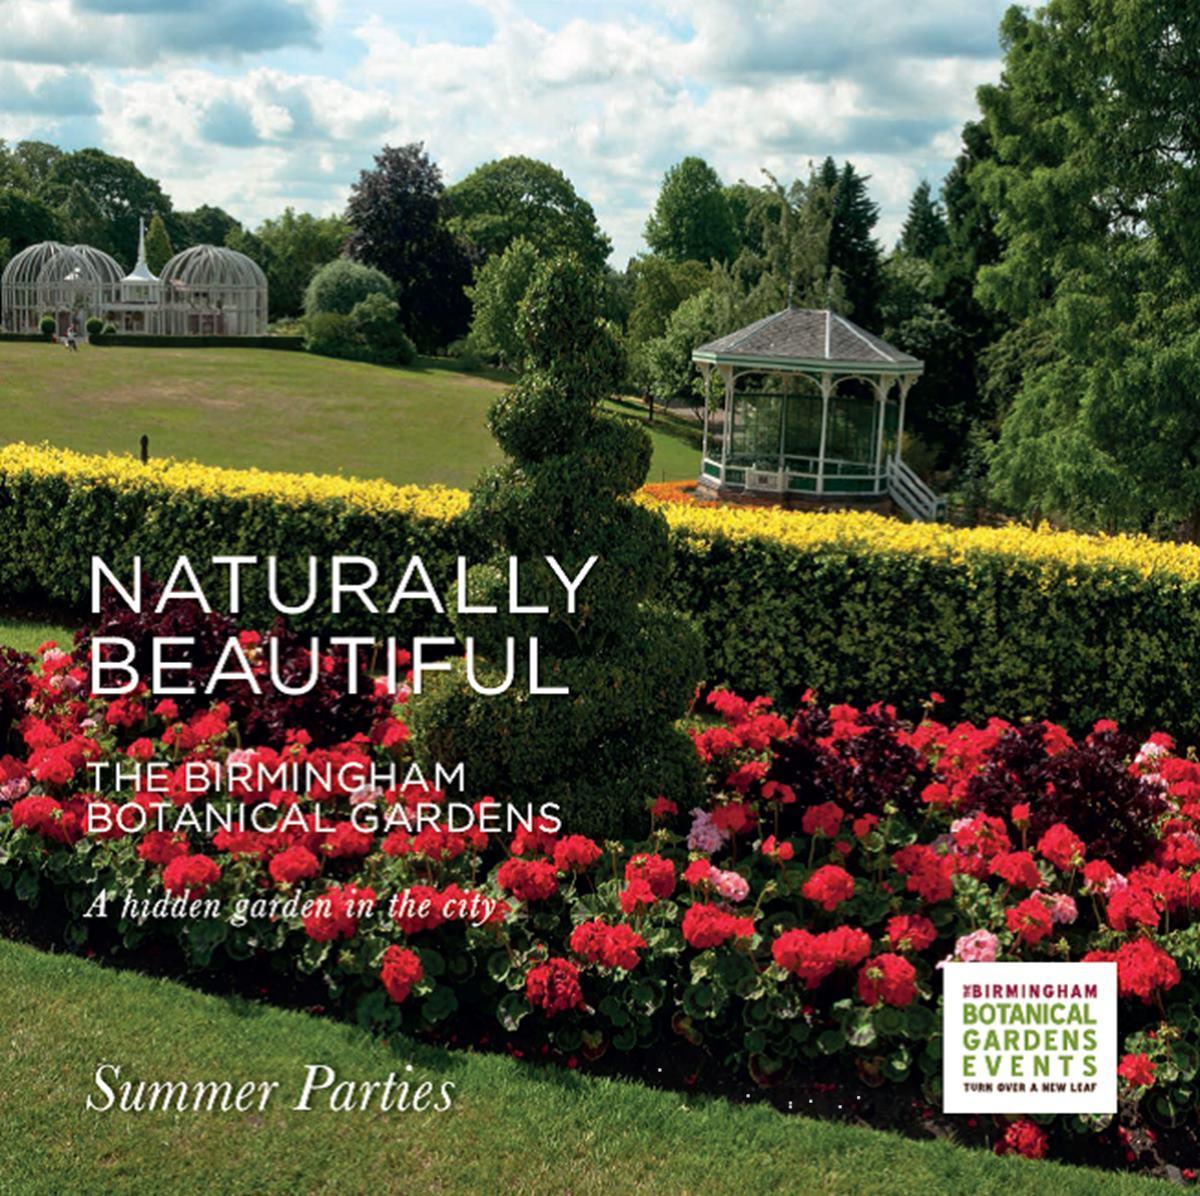 Summer Parties Events Birmingham Botanical Gardens